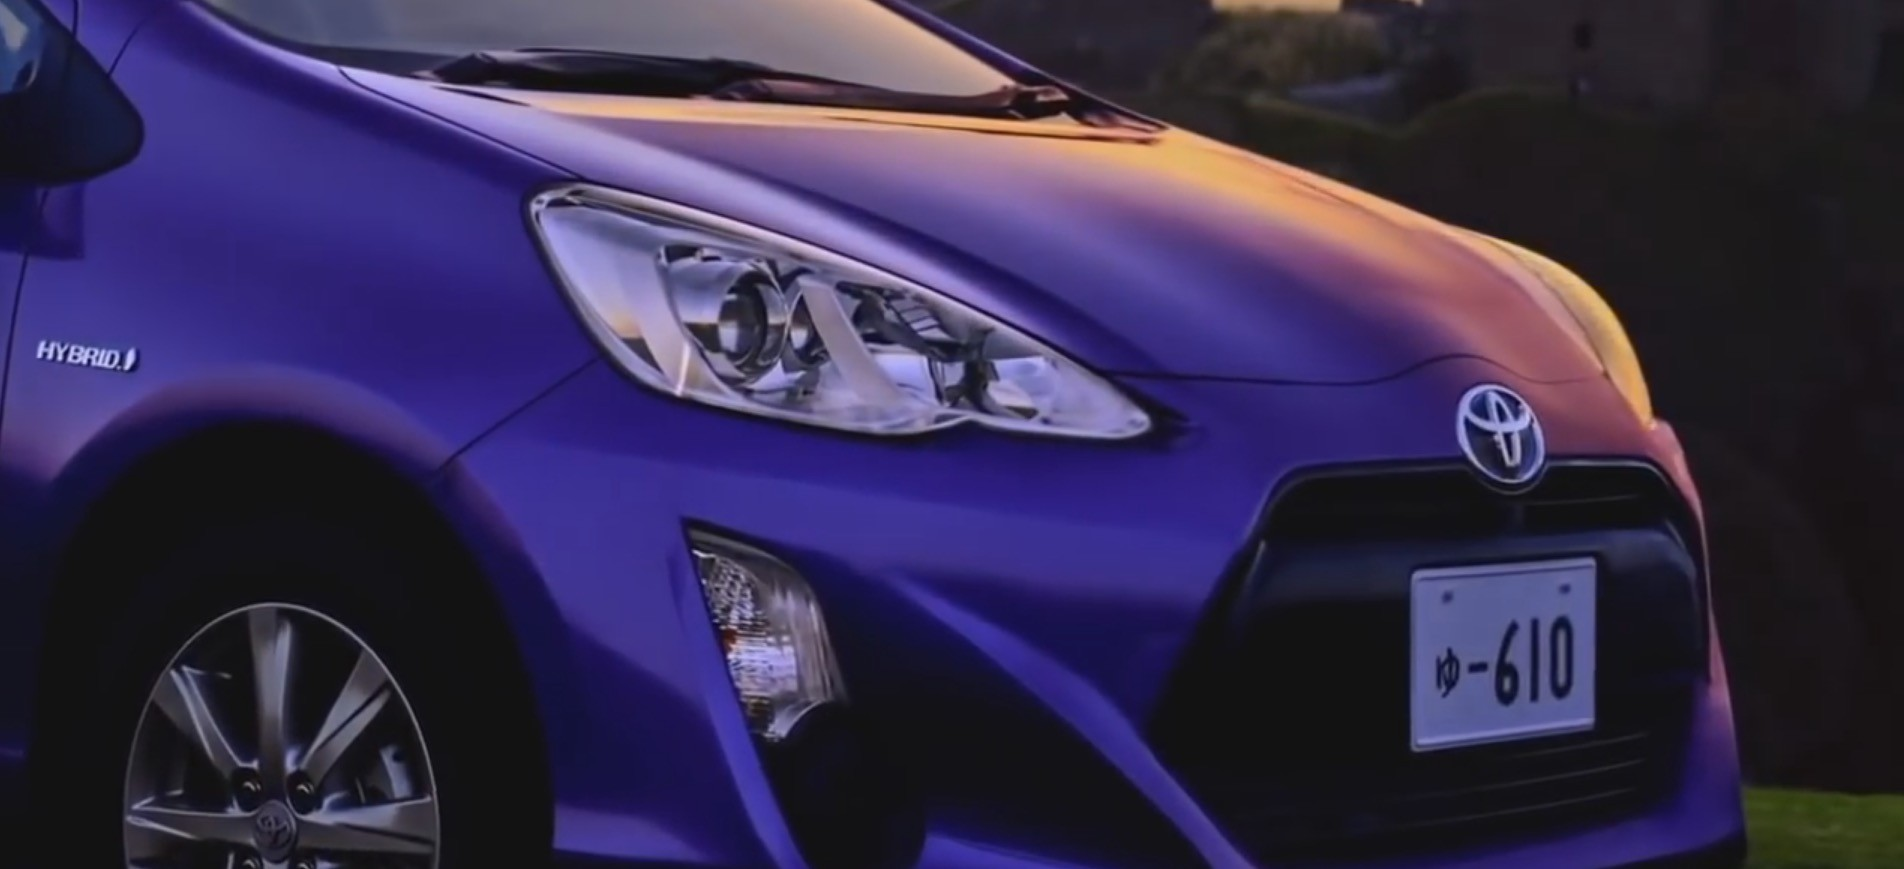 Toyota Aqua New TV Ad Featuring Hatsune Miku Song ...